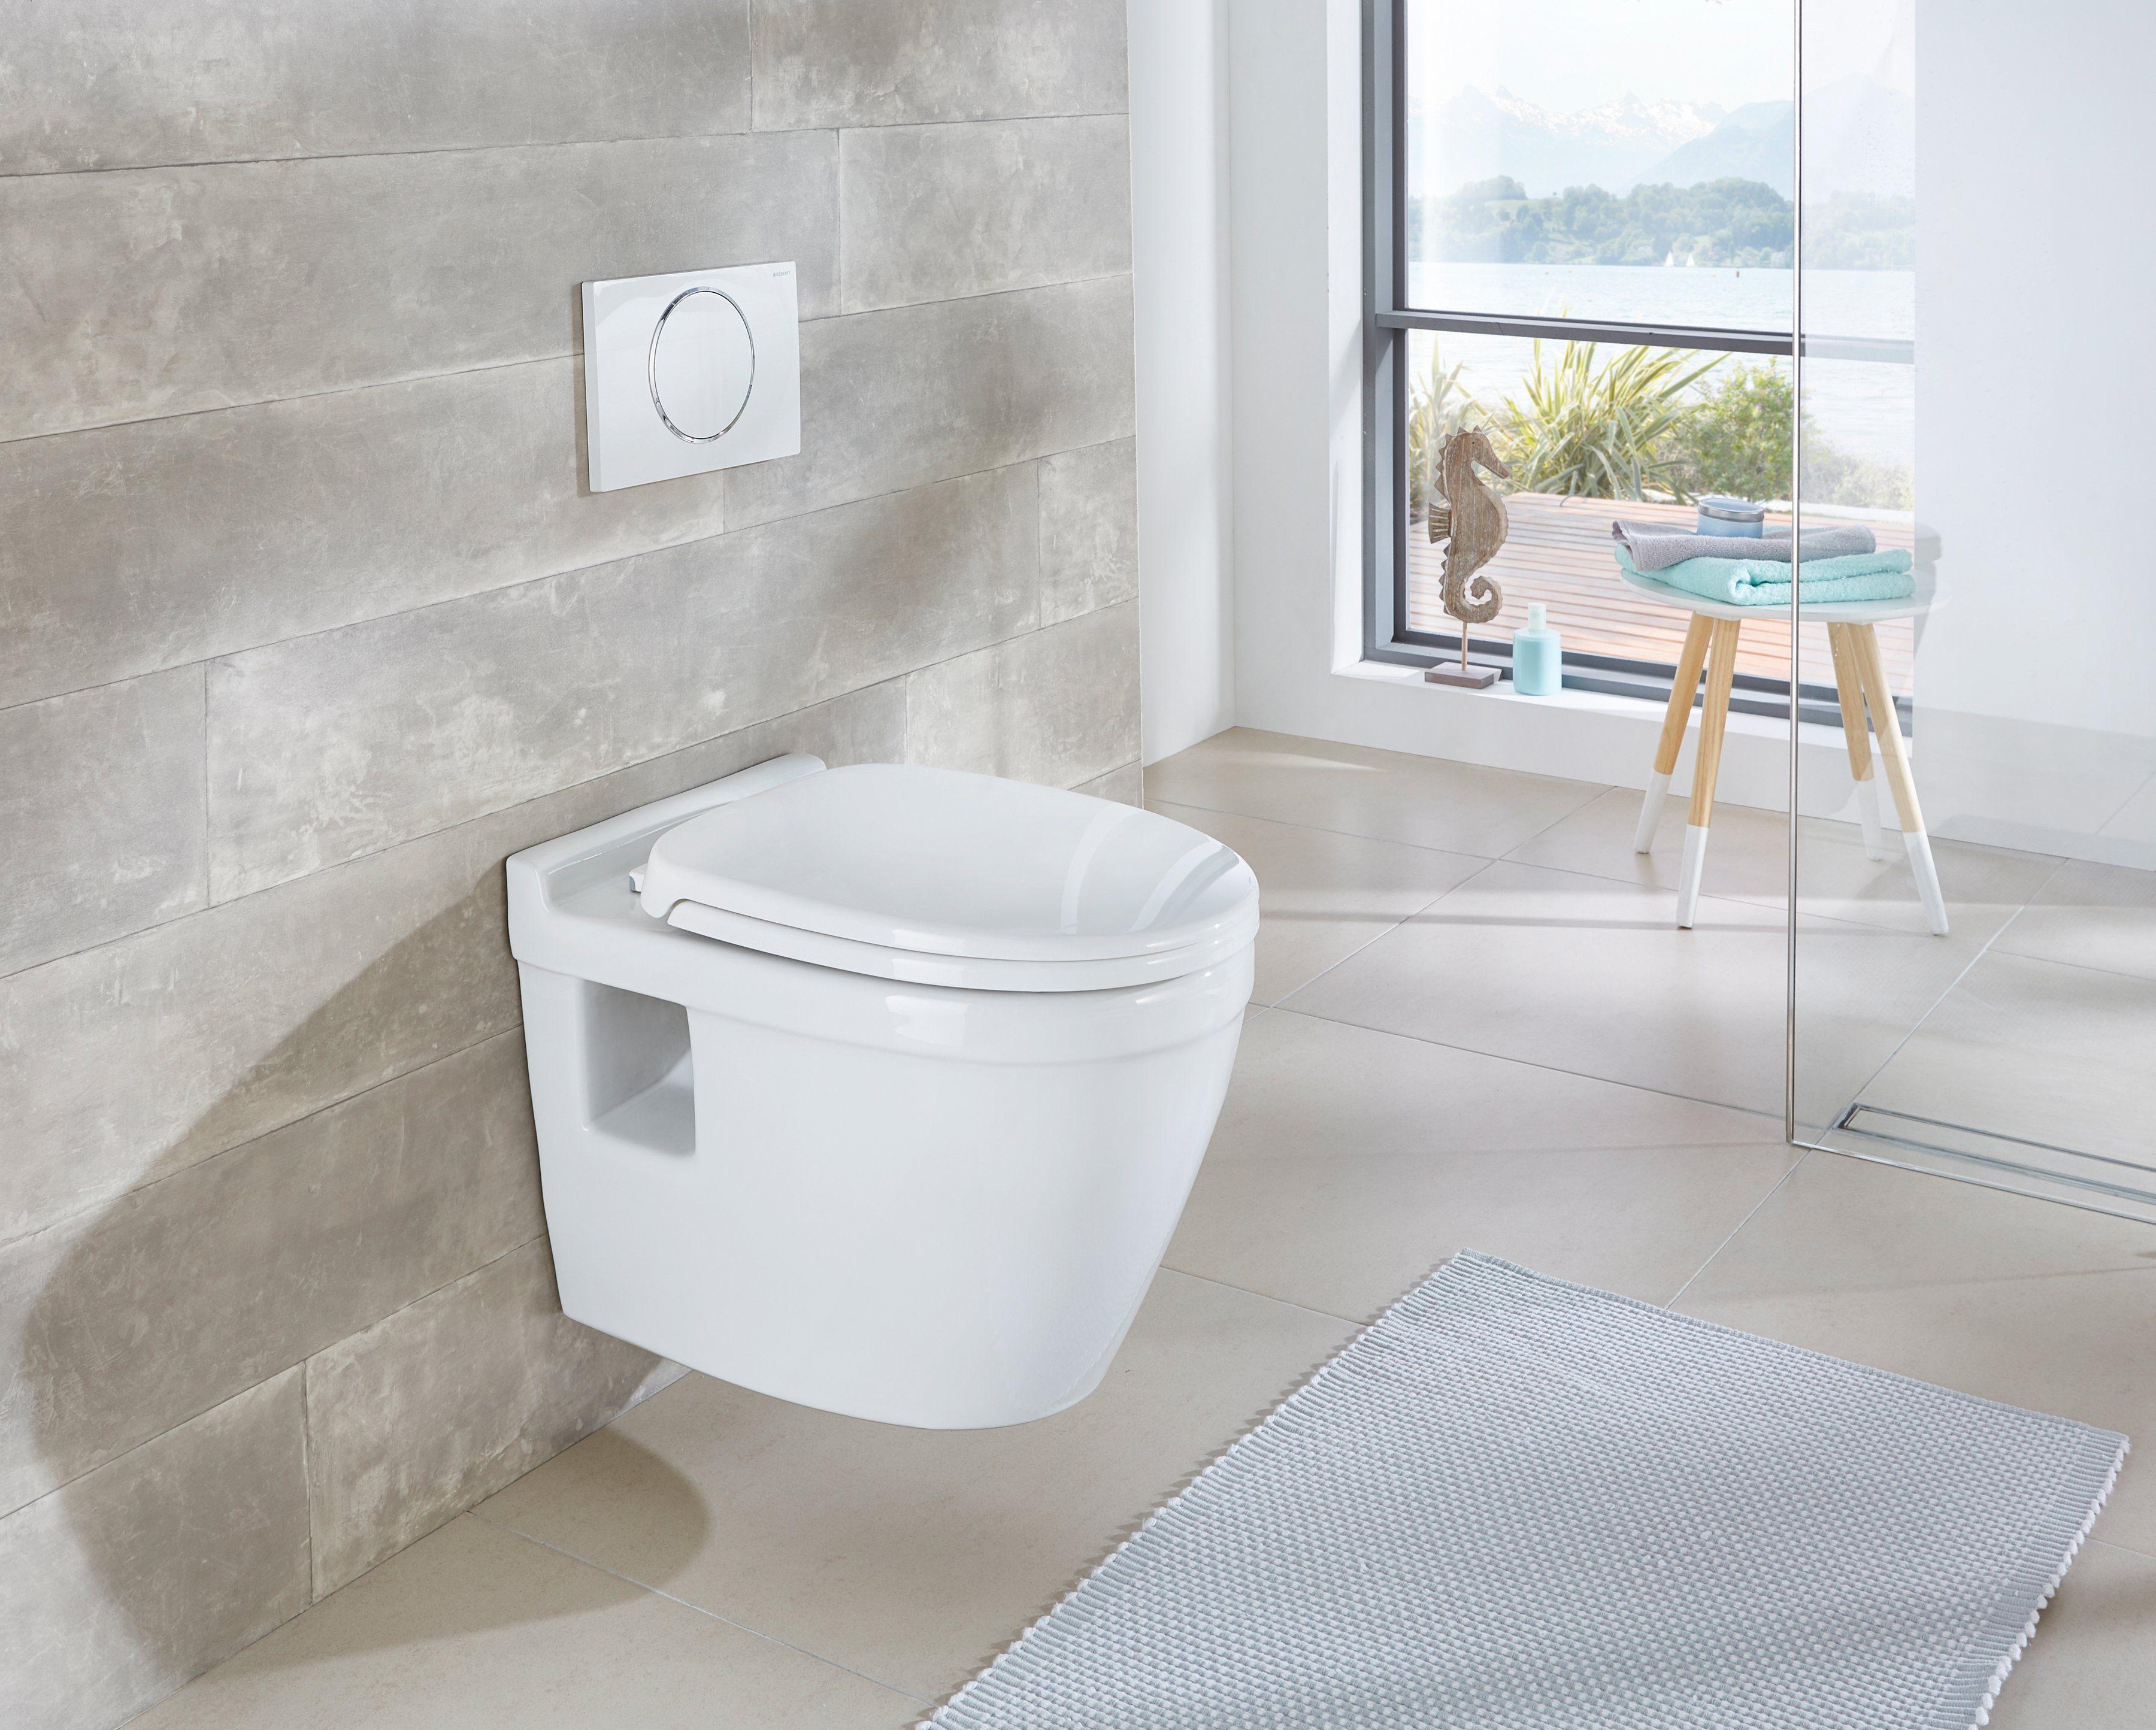 Wand WC »Dover«, Keramik Toilette inkl. WC-Sitz mit Softclose